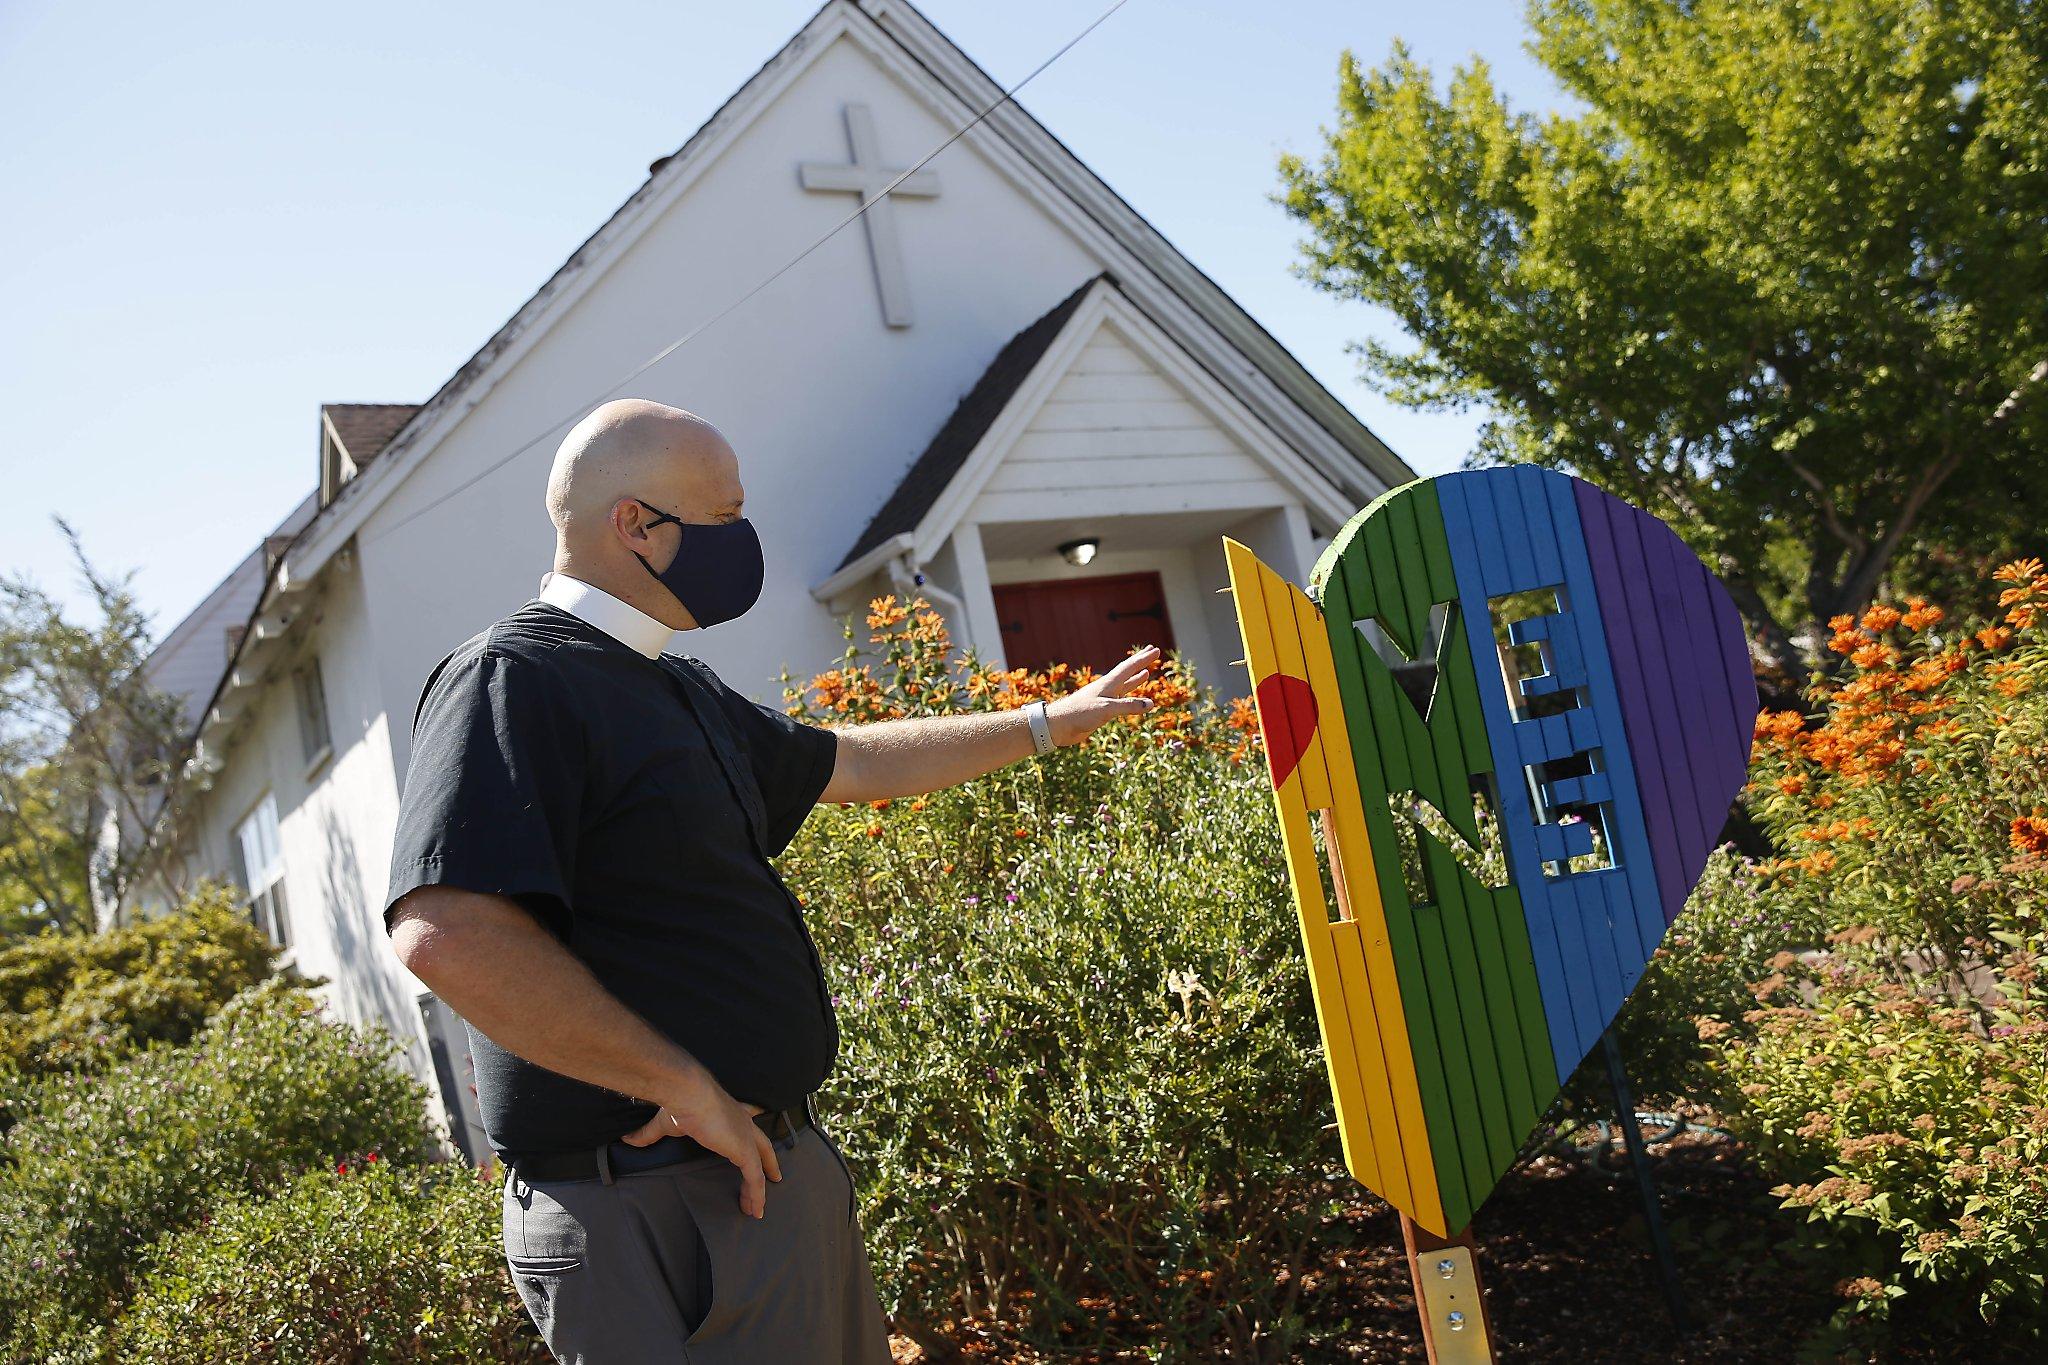 San Carlos minister uses divine inspiration, cameras to track anti-LGBTQ vandals